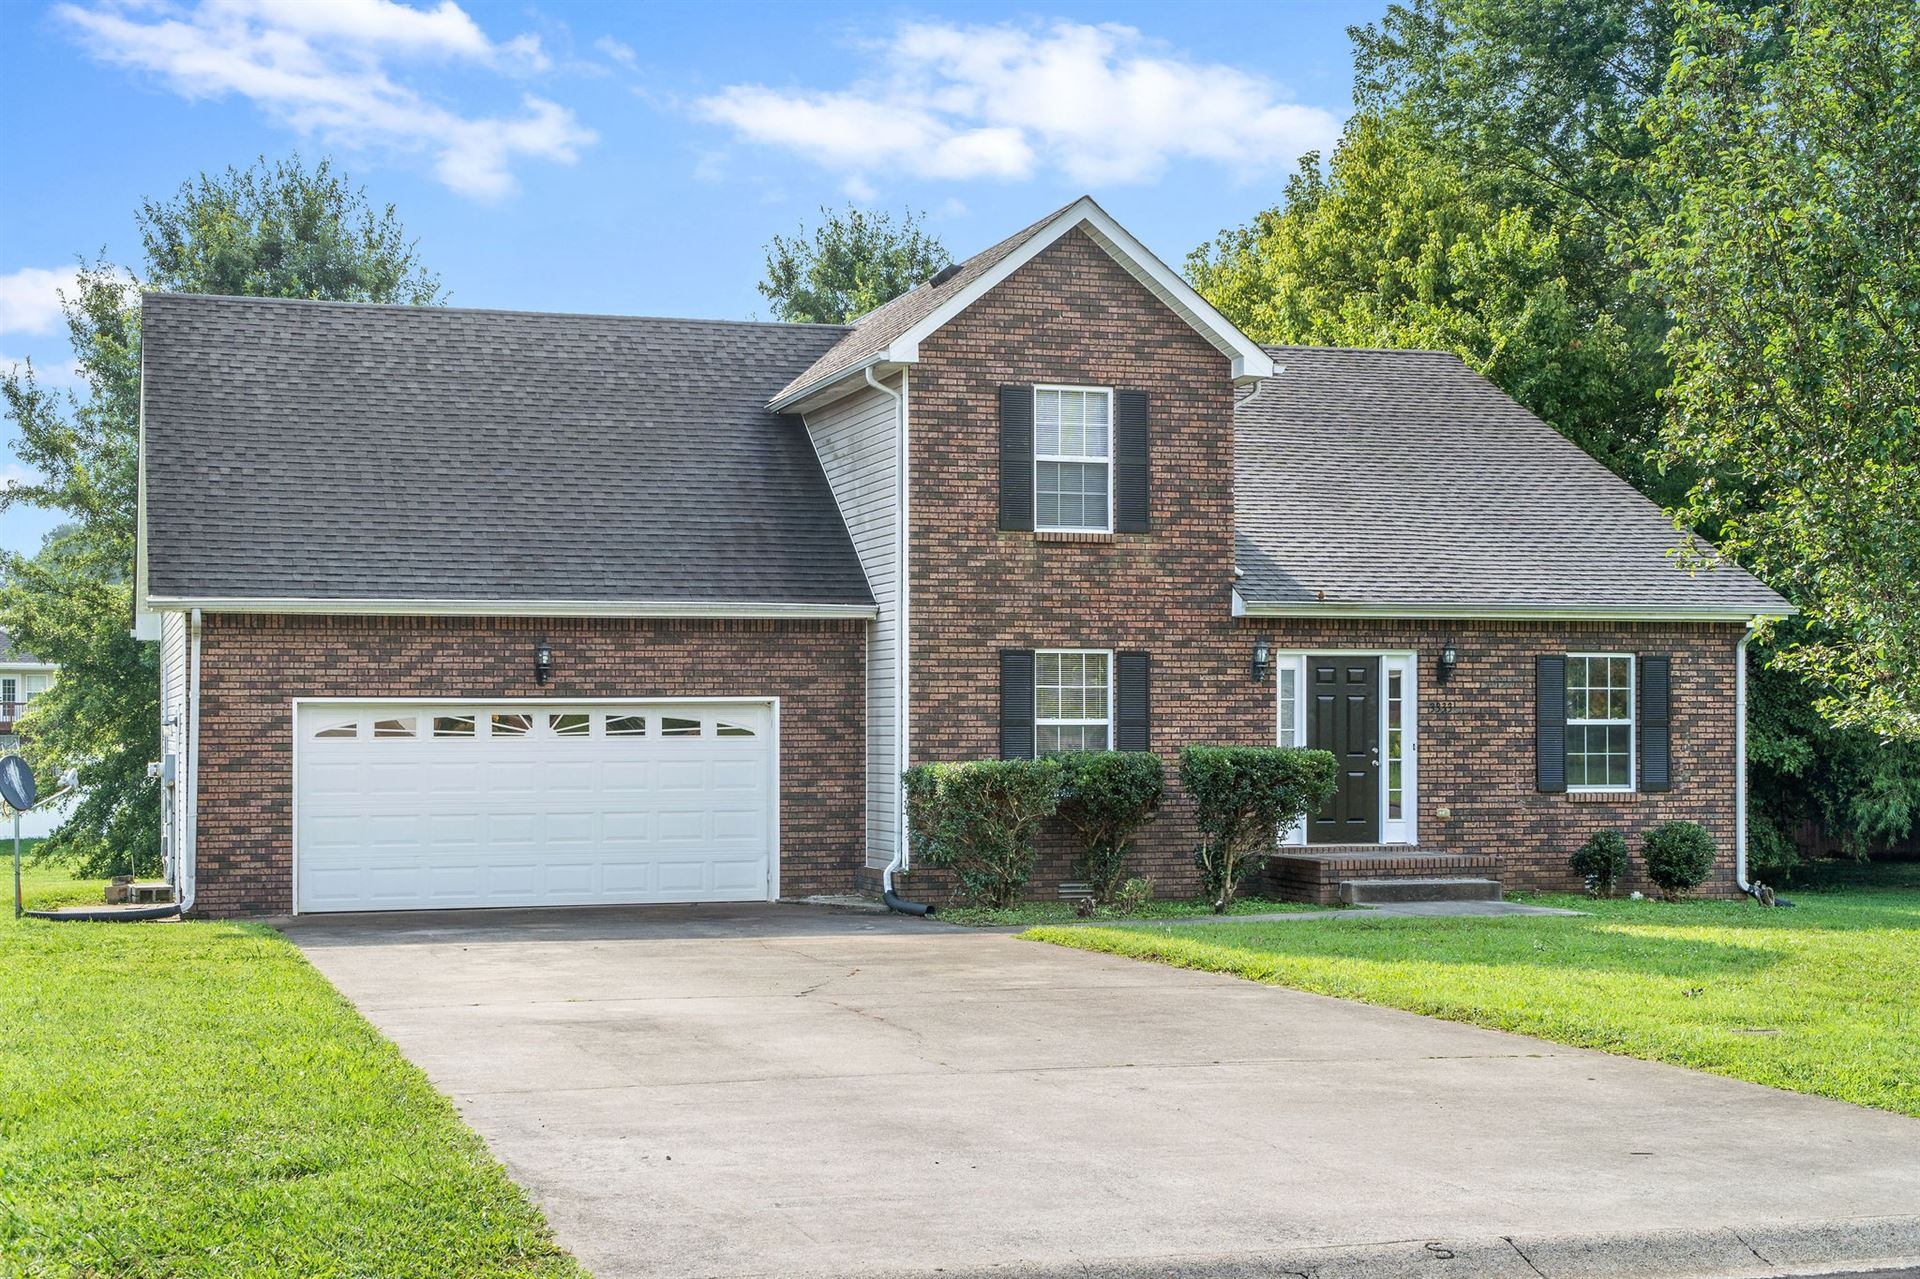 3333 Greenspoint Dr, Clarksville, TN 37042 - MLS#: 2276369